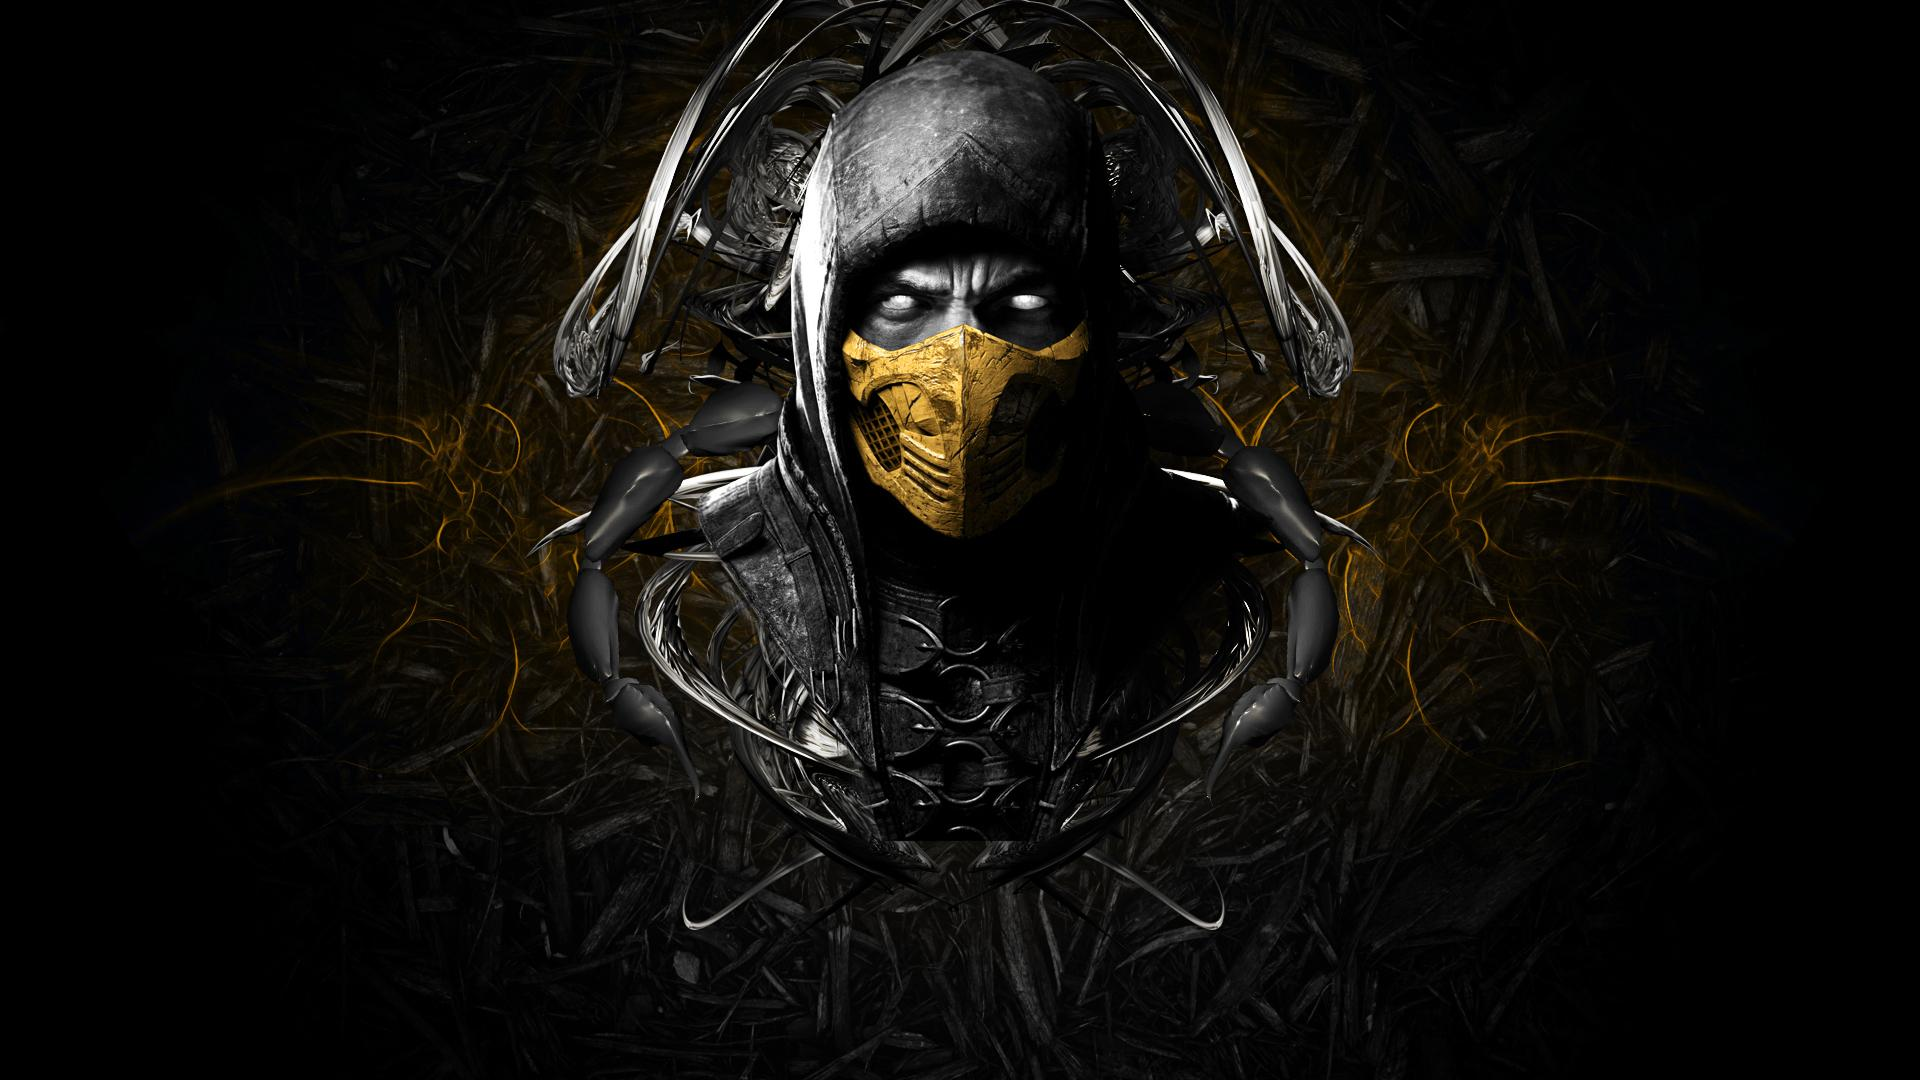 Download Mortal Kombat Phone Wallpaper Hd Backgrounds Download Itl Cat